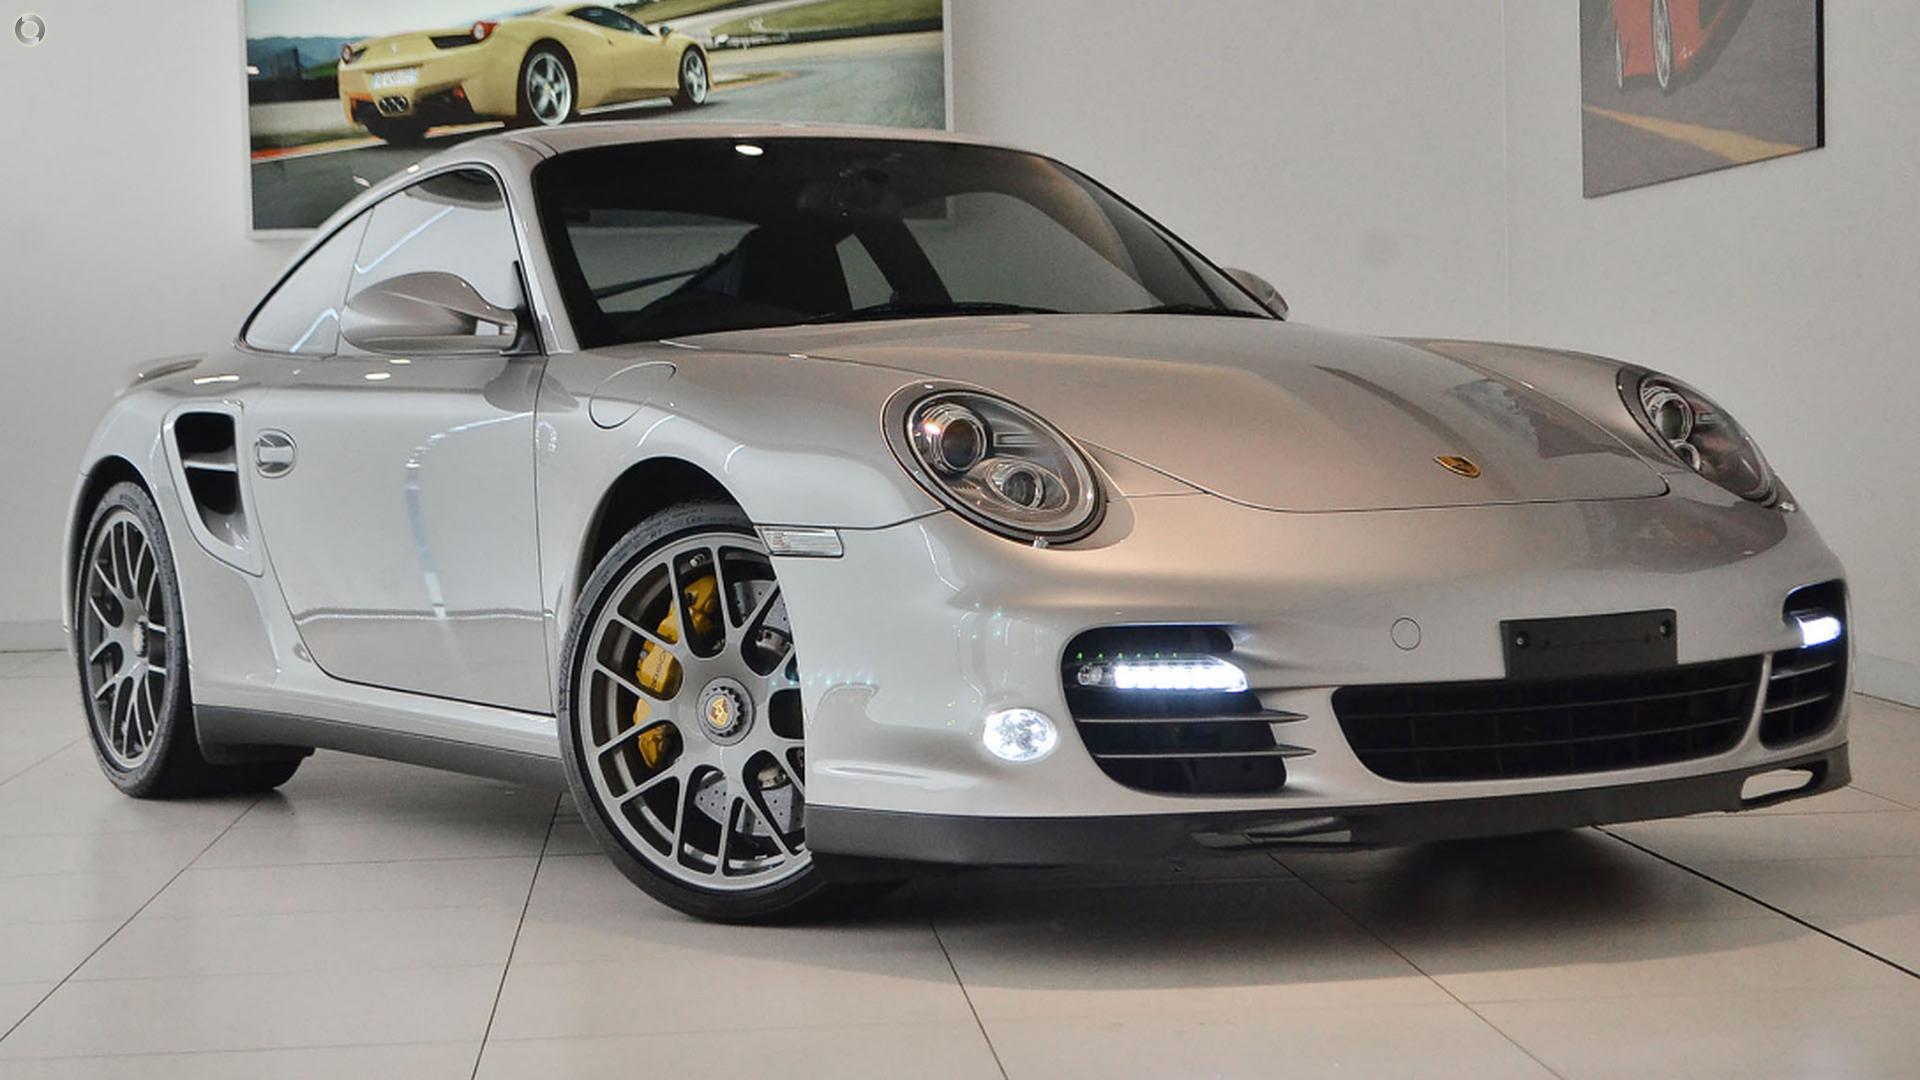 2010 Porsche 911 Turbo 997 Series II